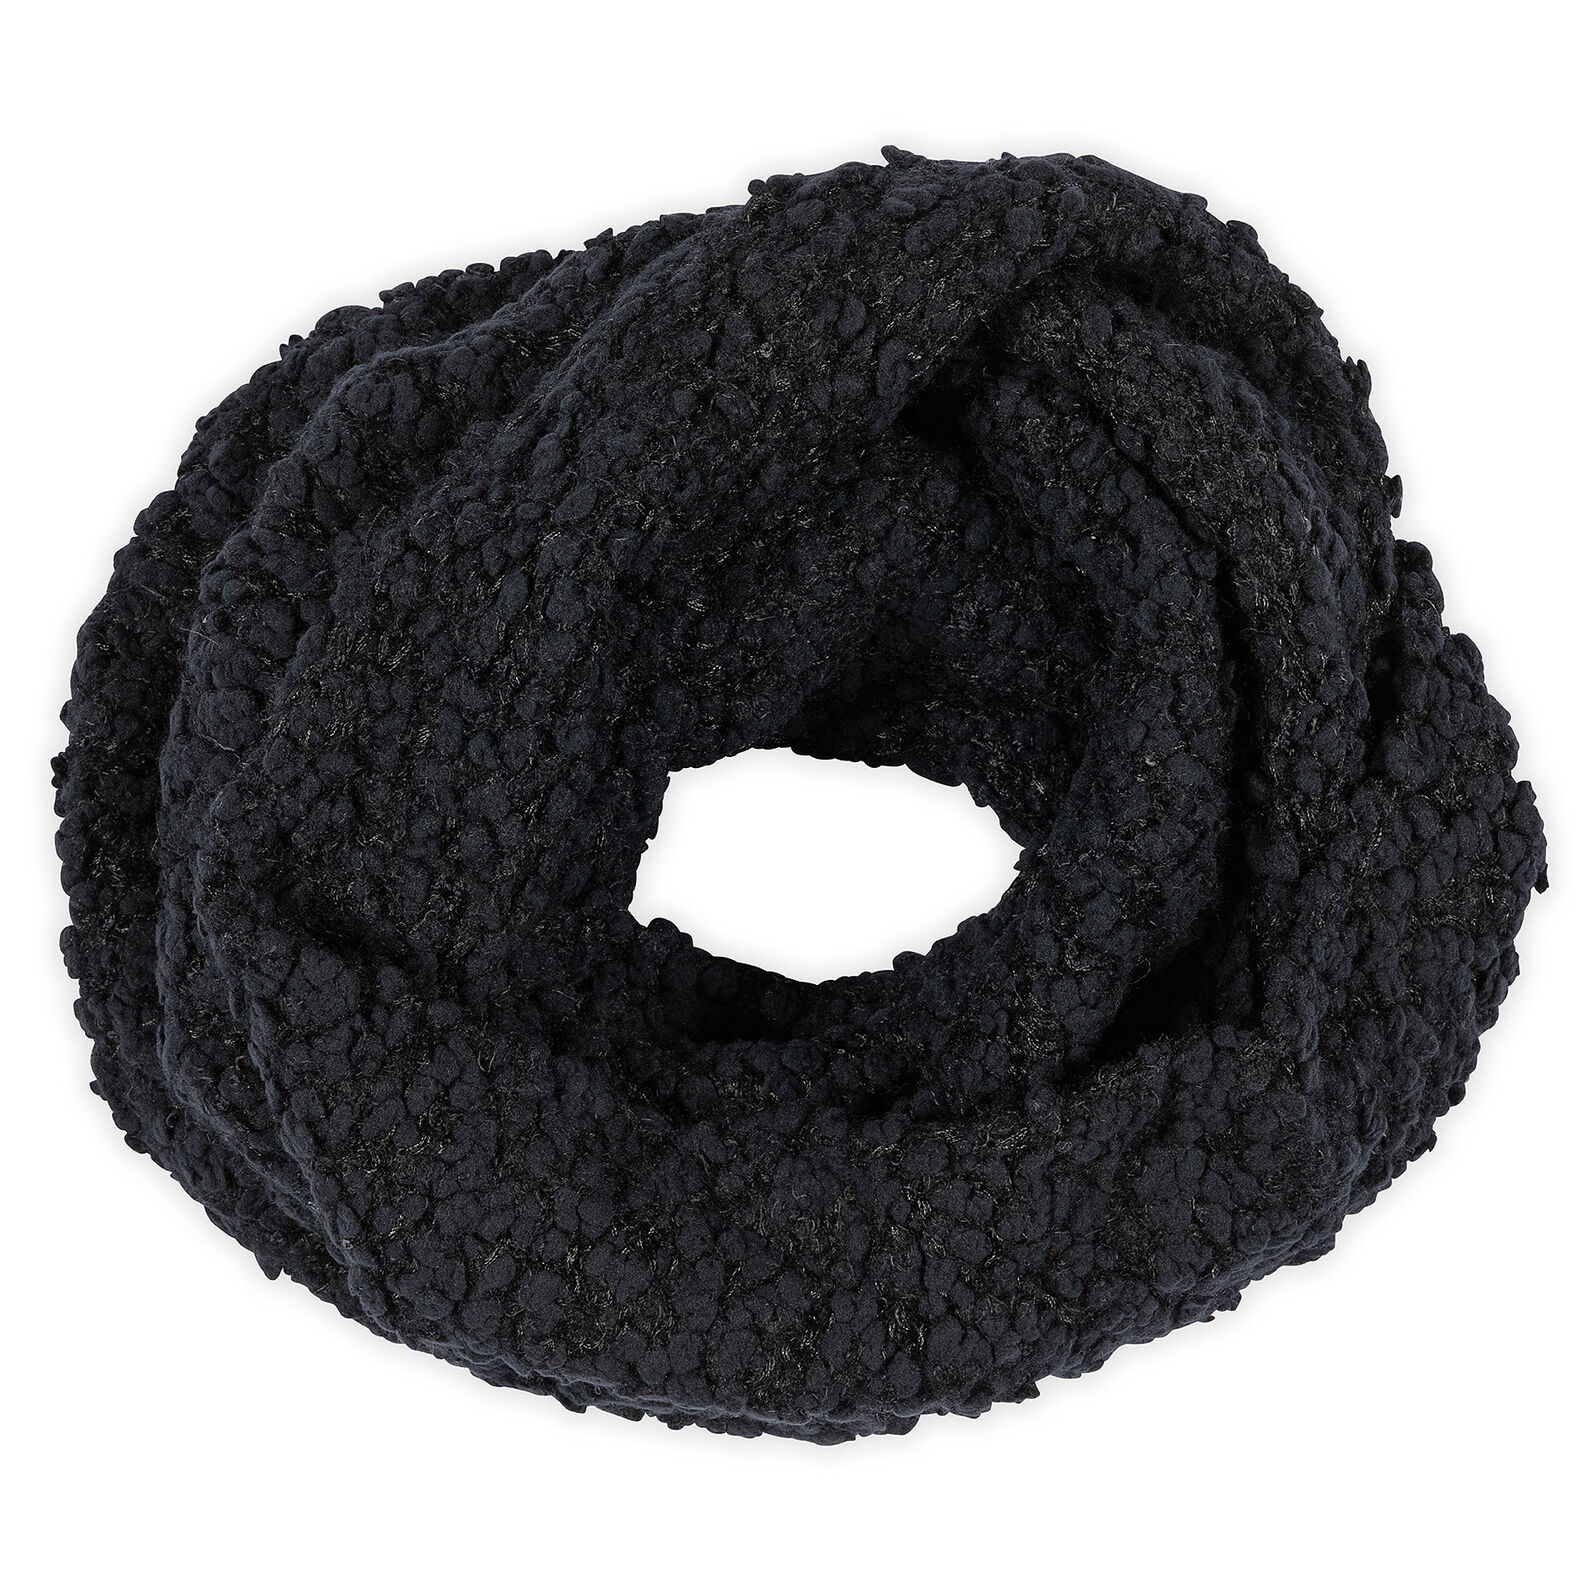 Koan soft fabric scarf